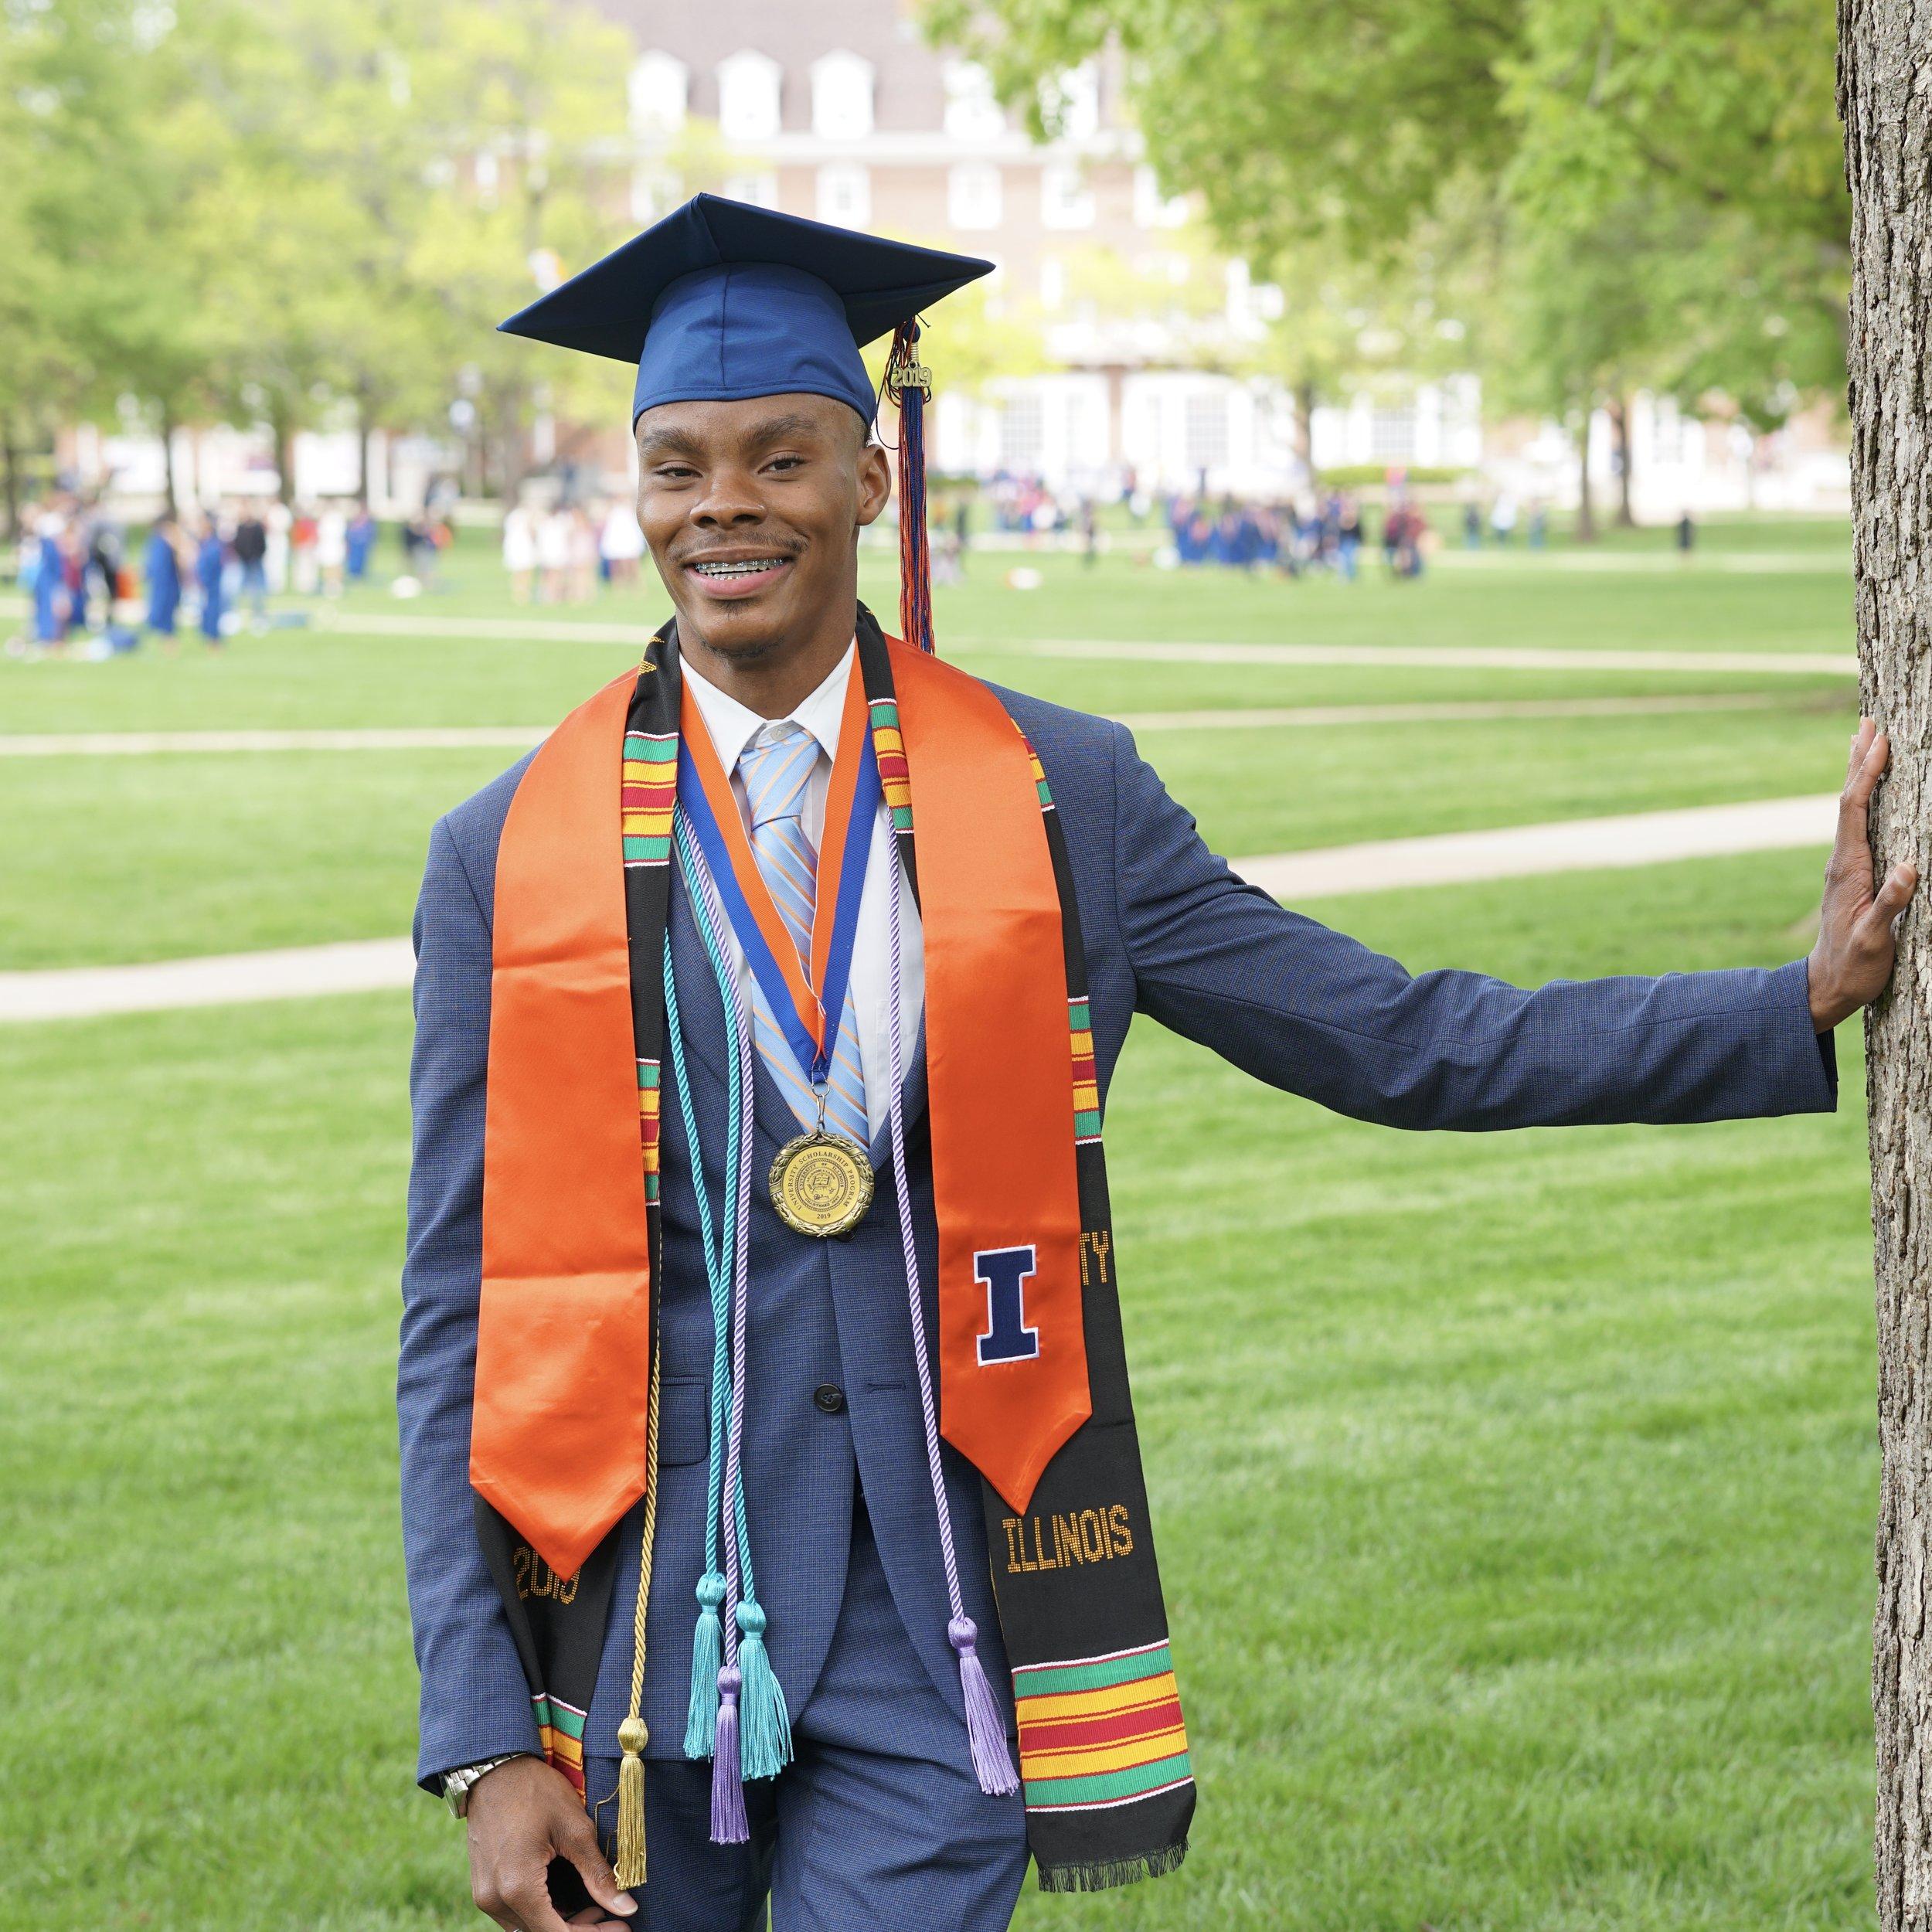 James Jones, BA - University of Illinois, Class of 2019